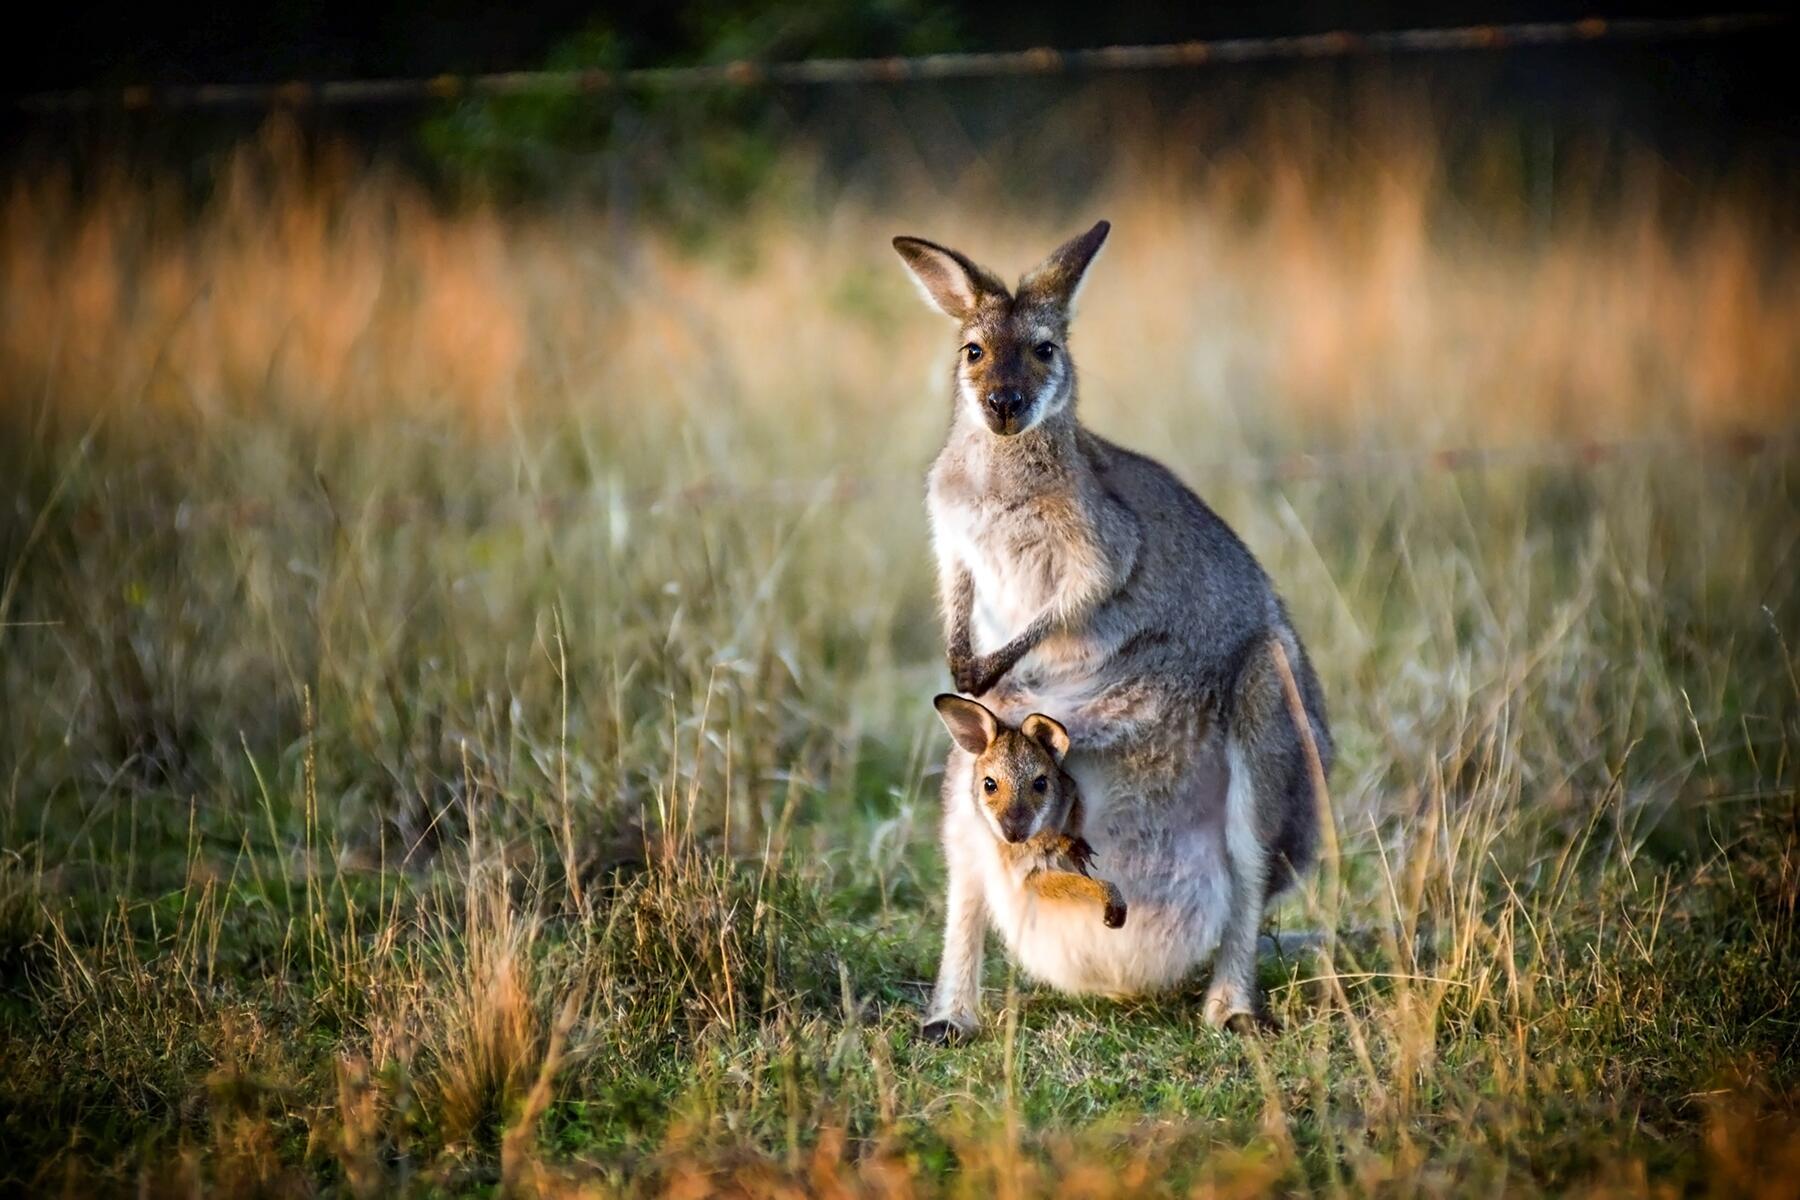 02_AustraliasCutestCubs__Kangaroo_shutterstock_60942844